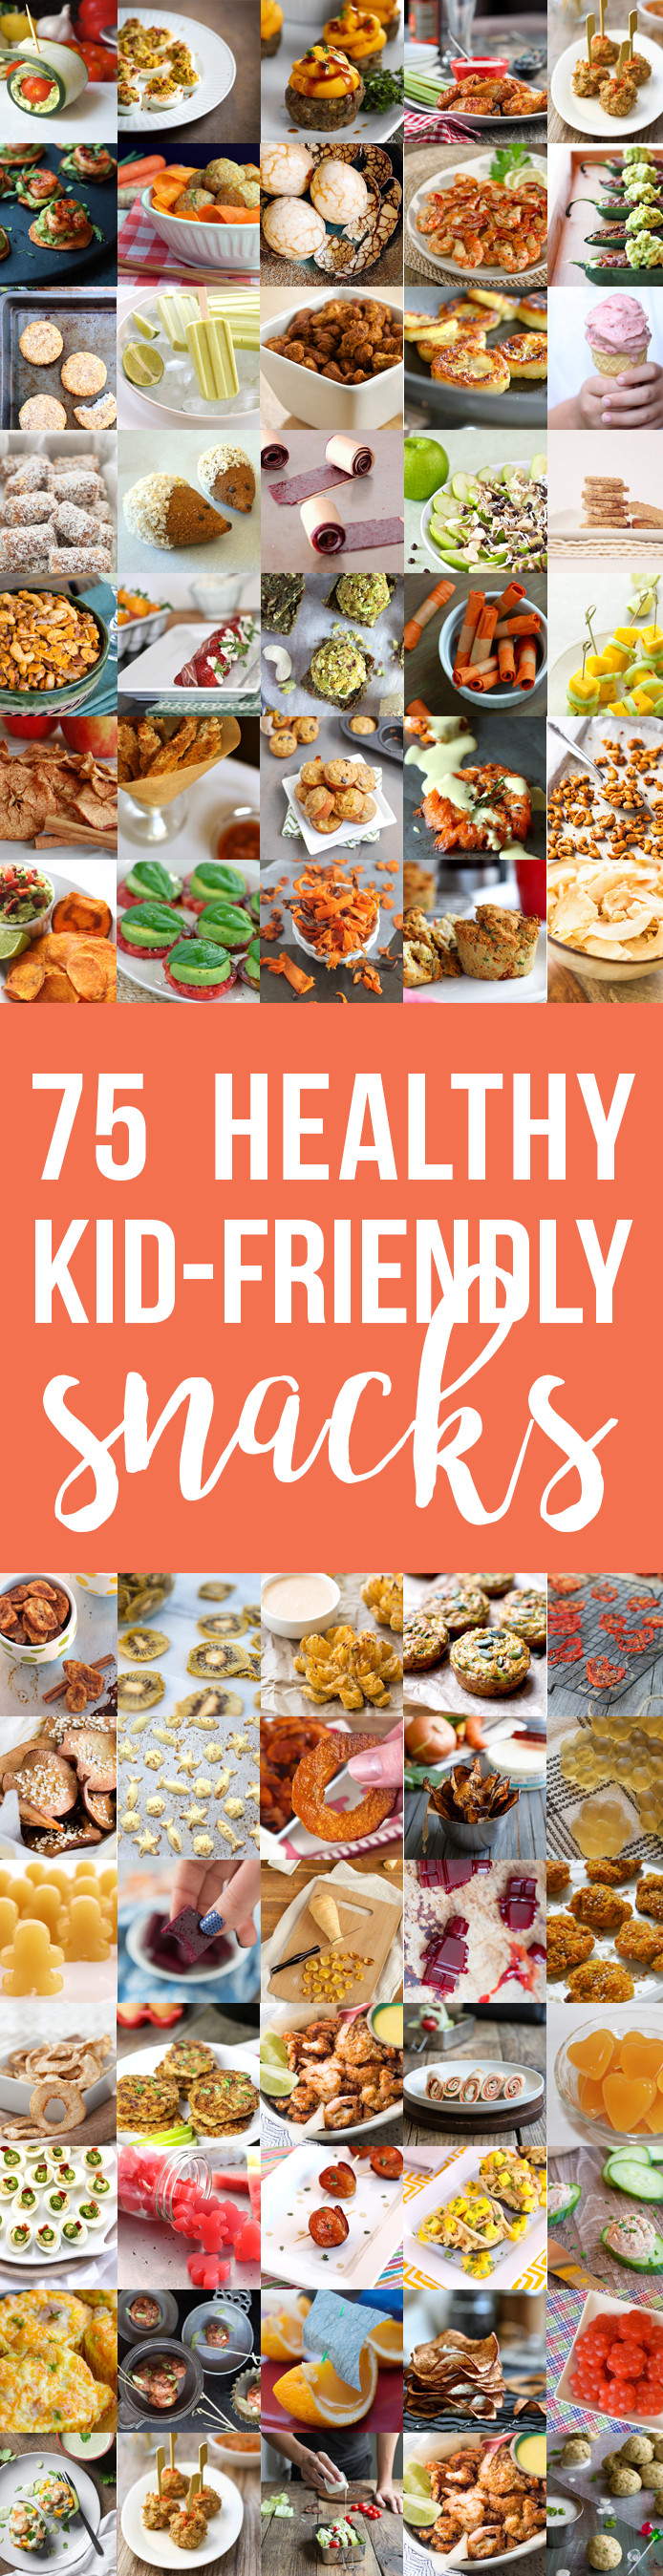 Healthy Kid Friendly Snacks  75 Healthy Kid Friendly Snacks